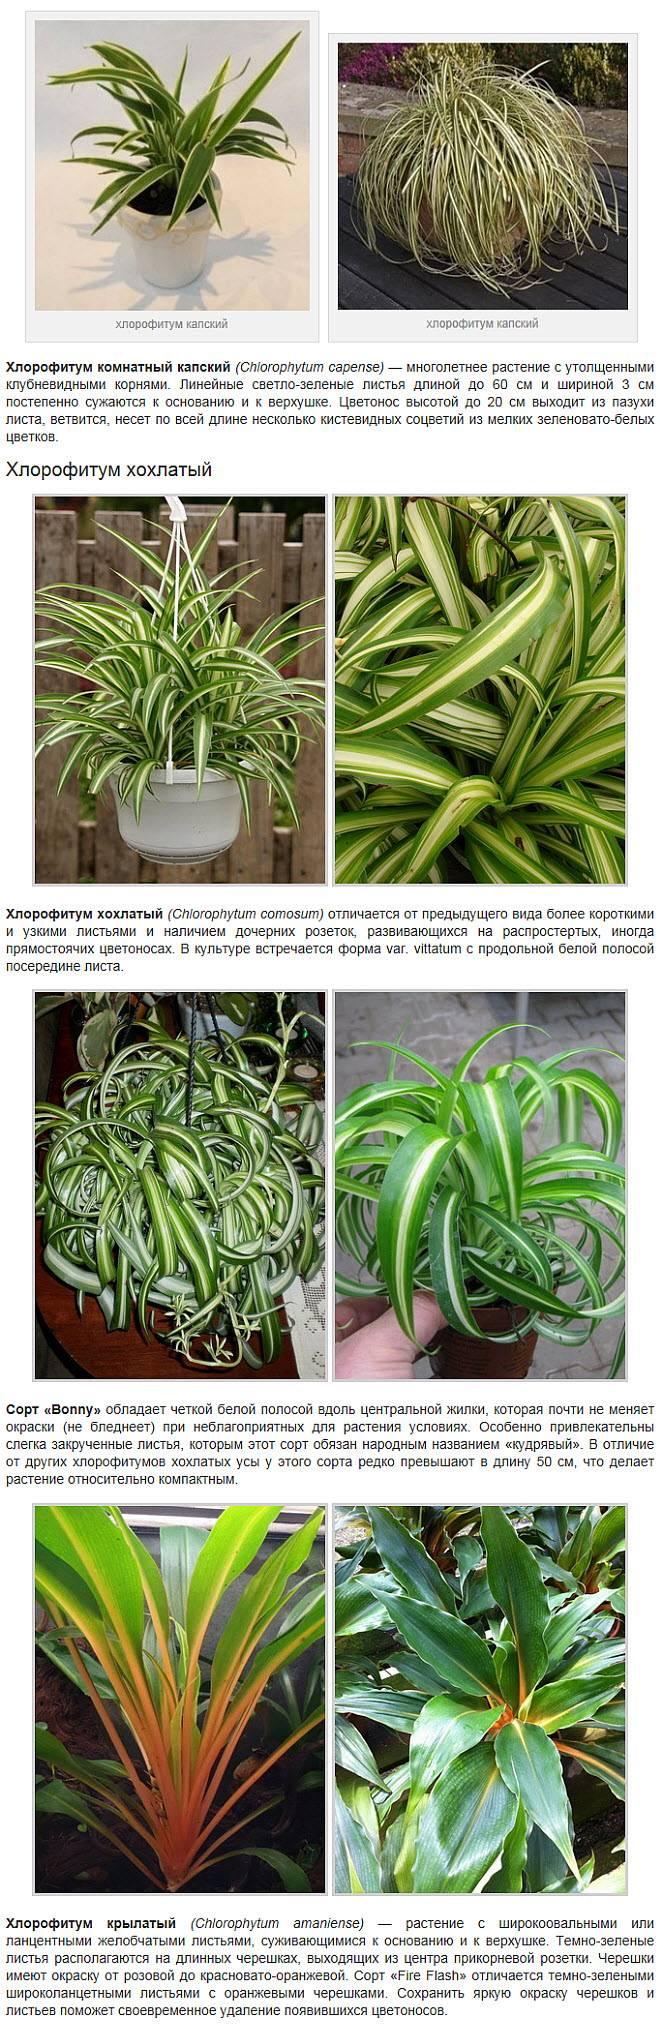 Особенности выращивания хлорофитума в домашних условиях